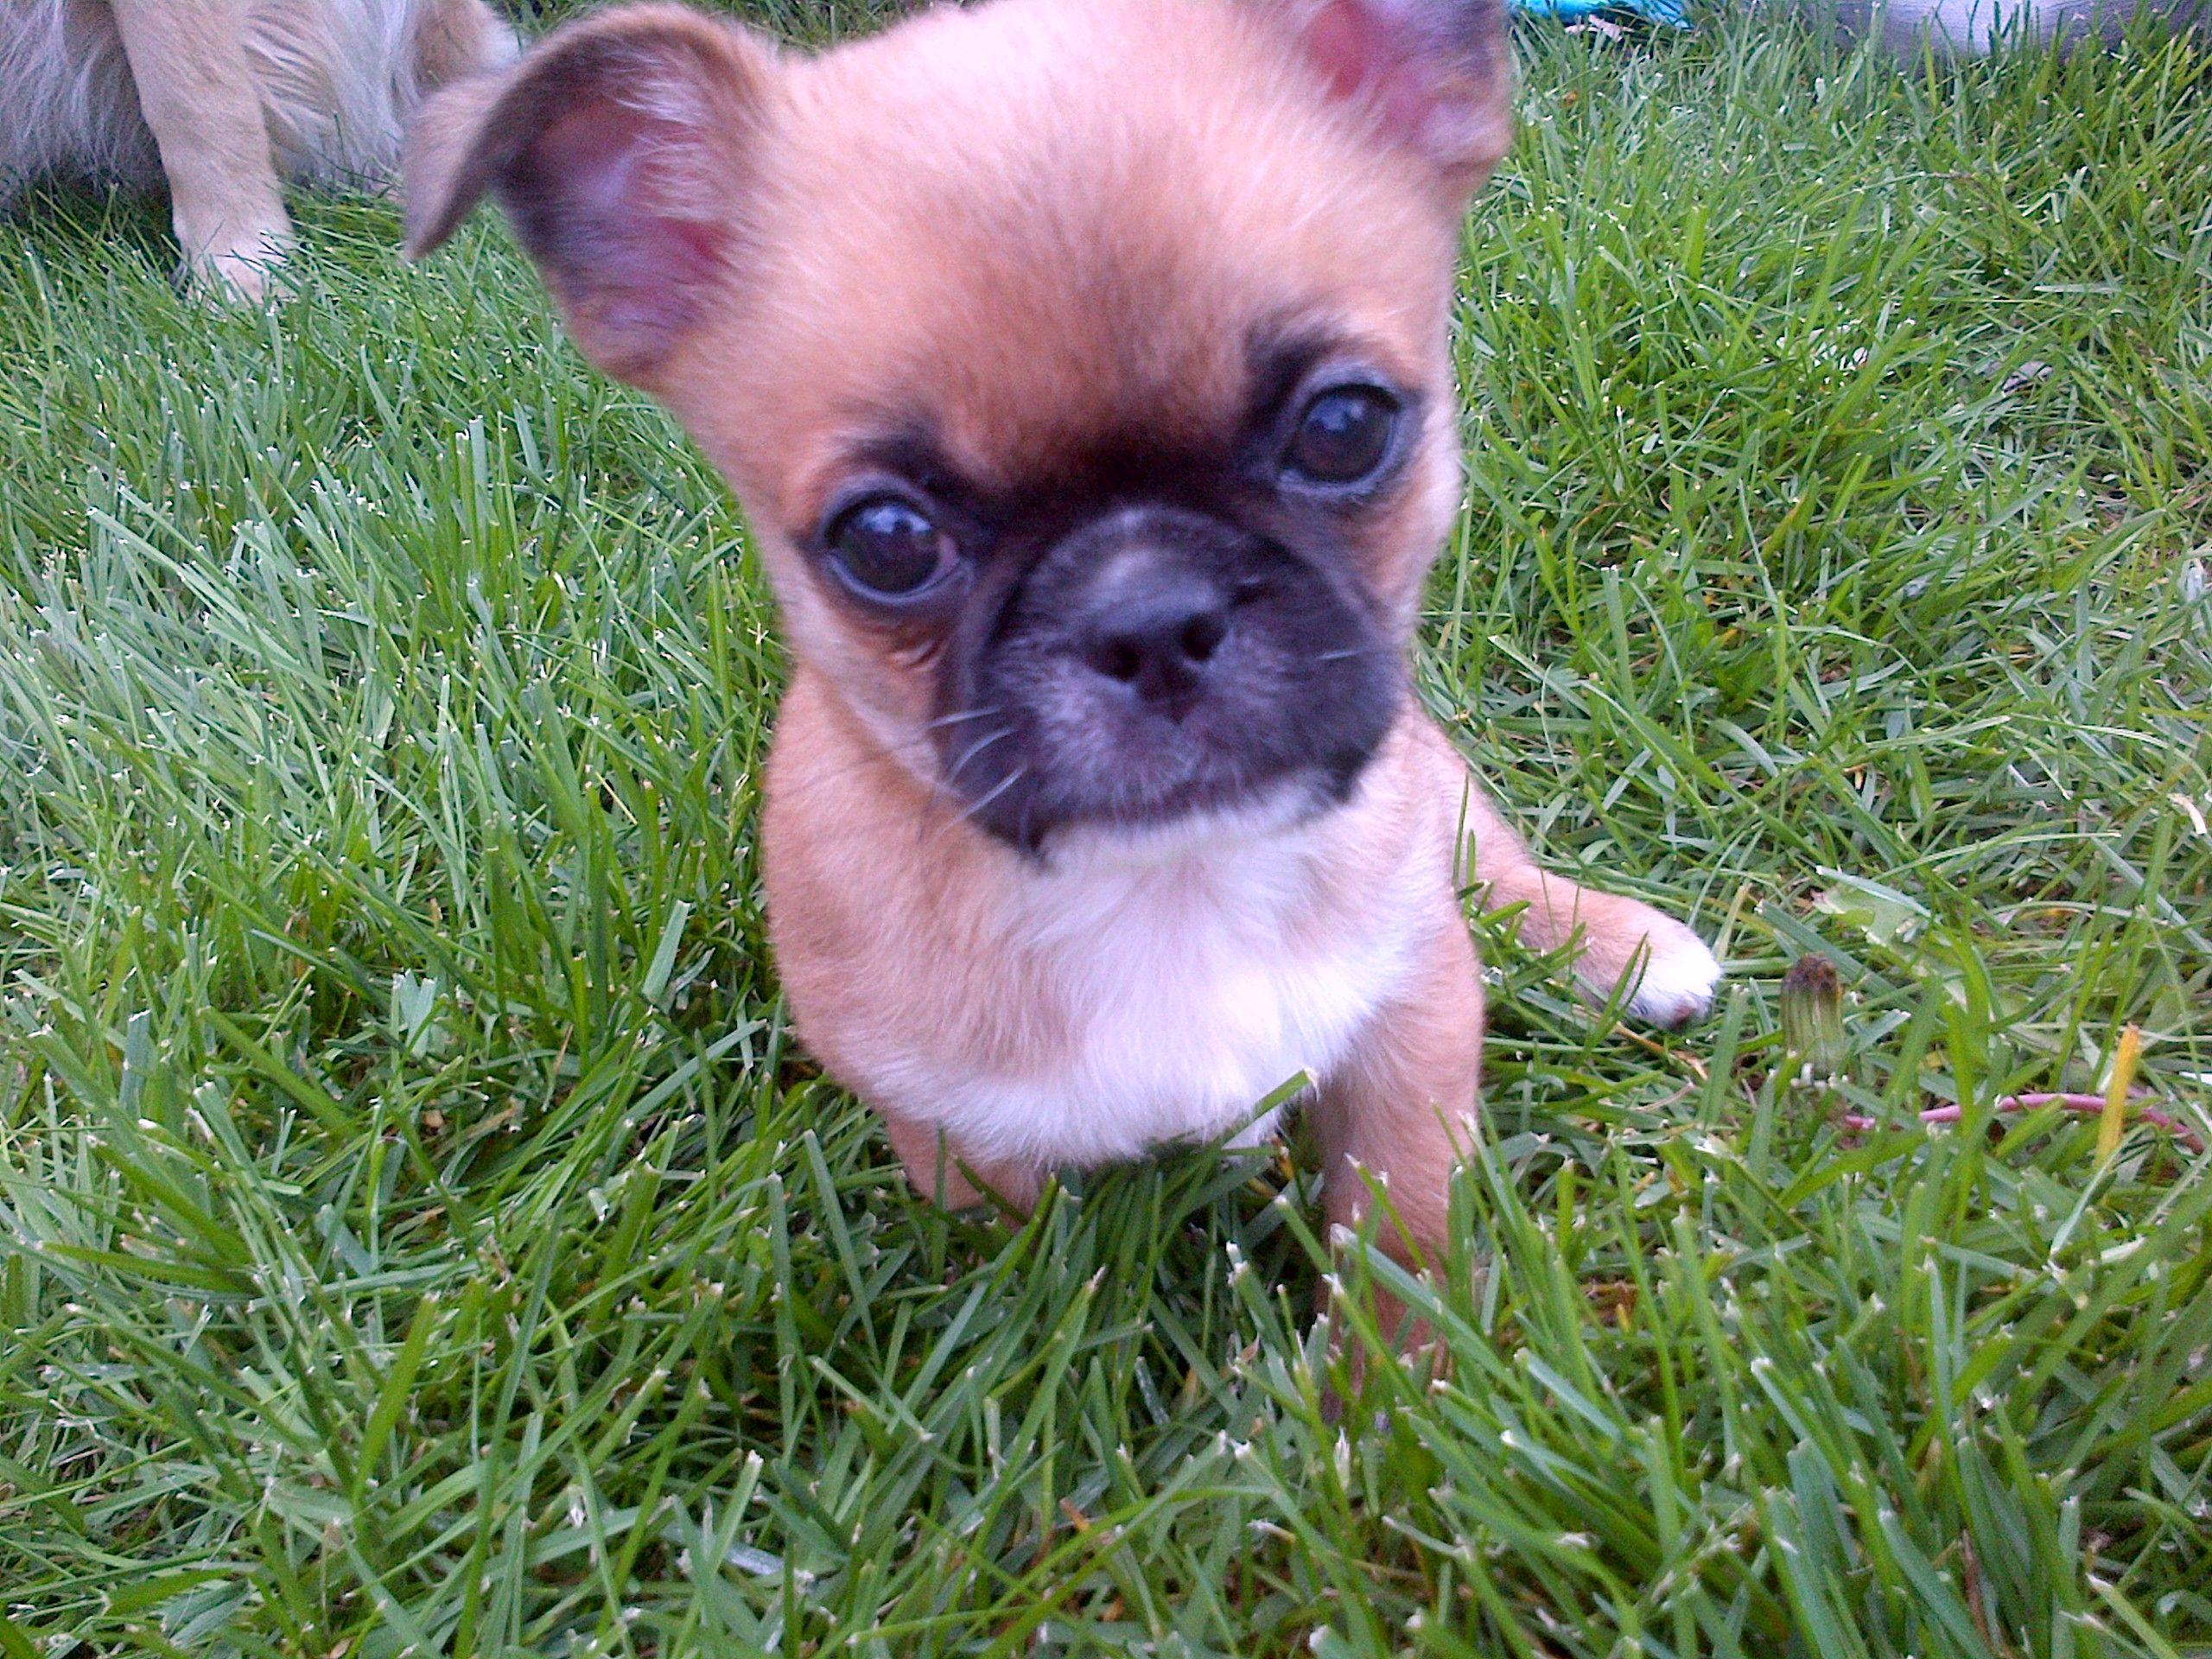 Pics photos dachshund chihuahua dog mix dogs pictures photos pics - Chihuahua Pekingese Mix Cheek